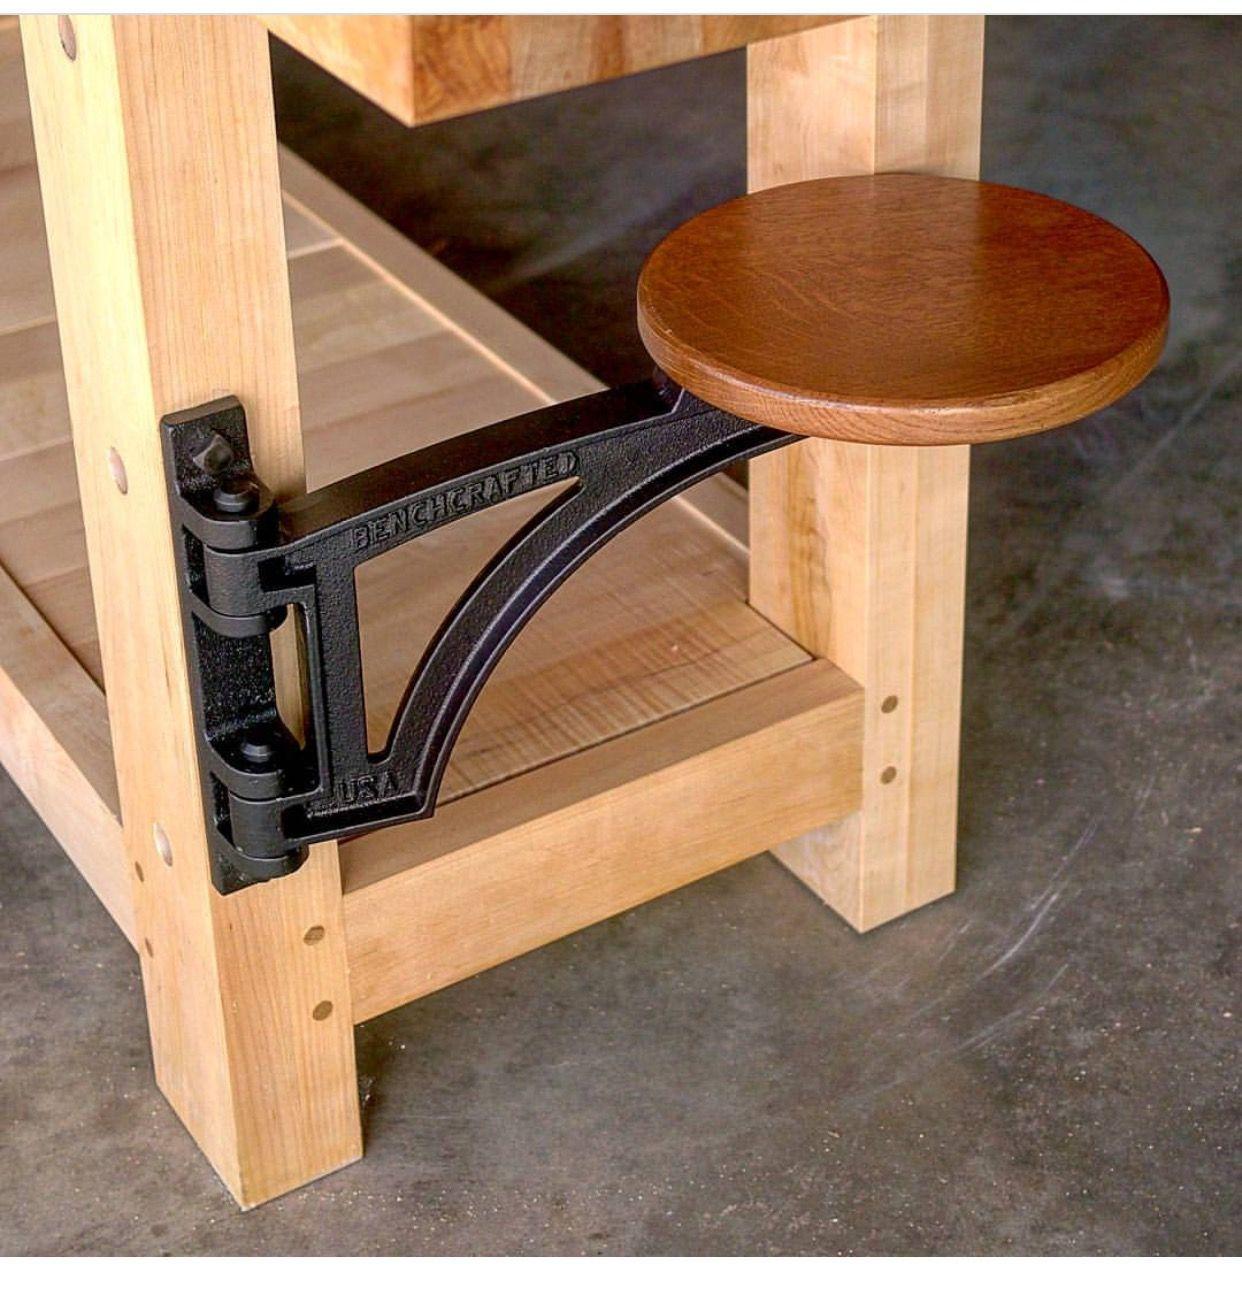 16 Awe Inspiring Wood Working Bench Decks Ideas With Images